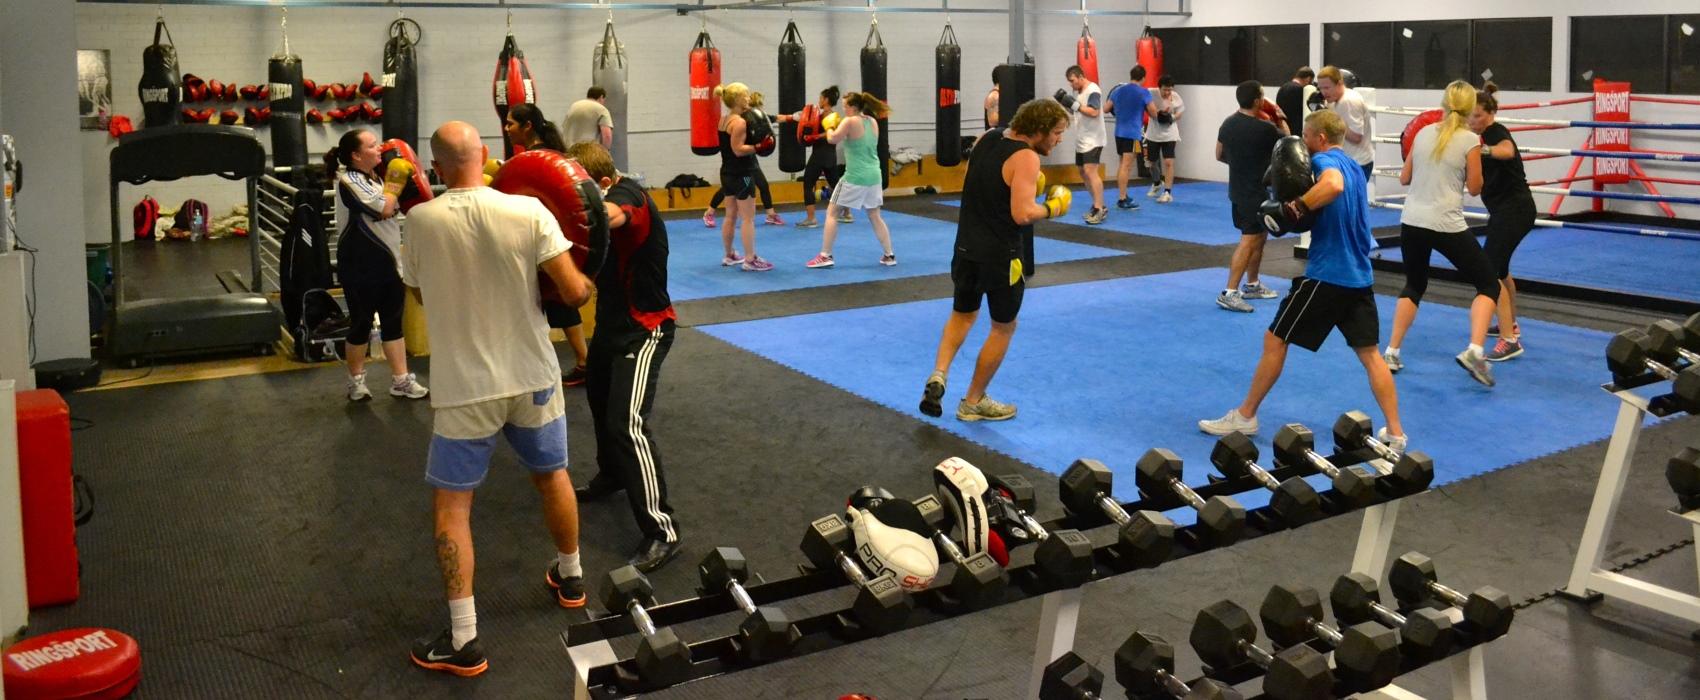 Premier boxing club round pad training